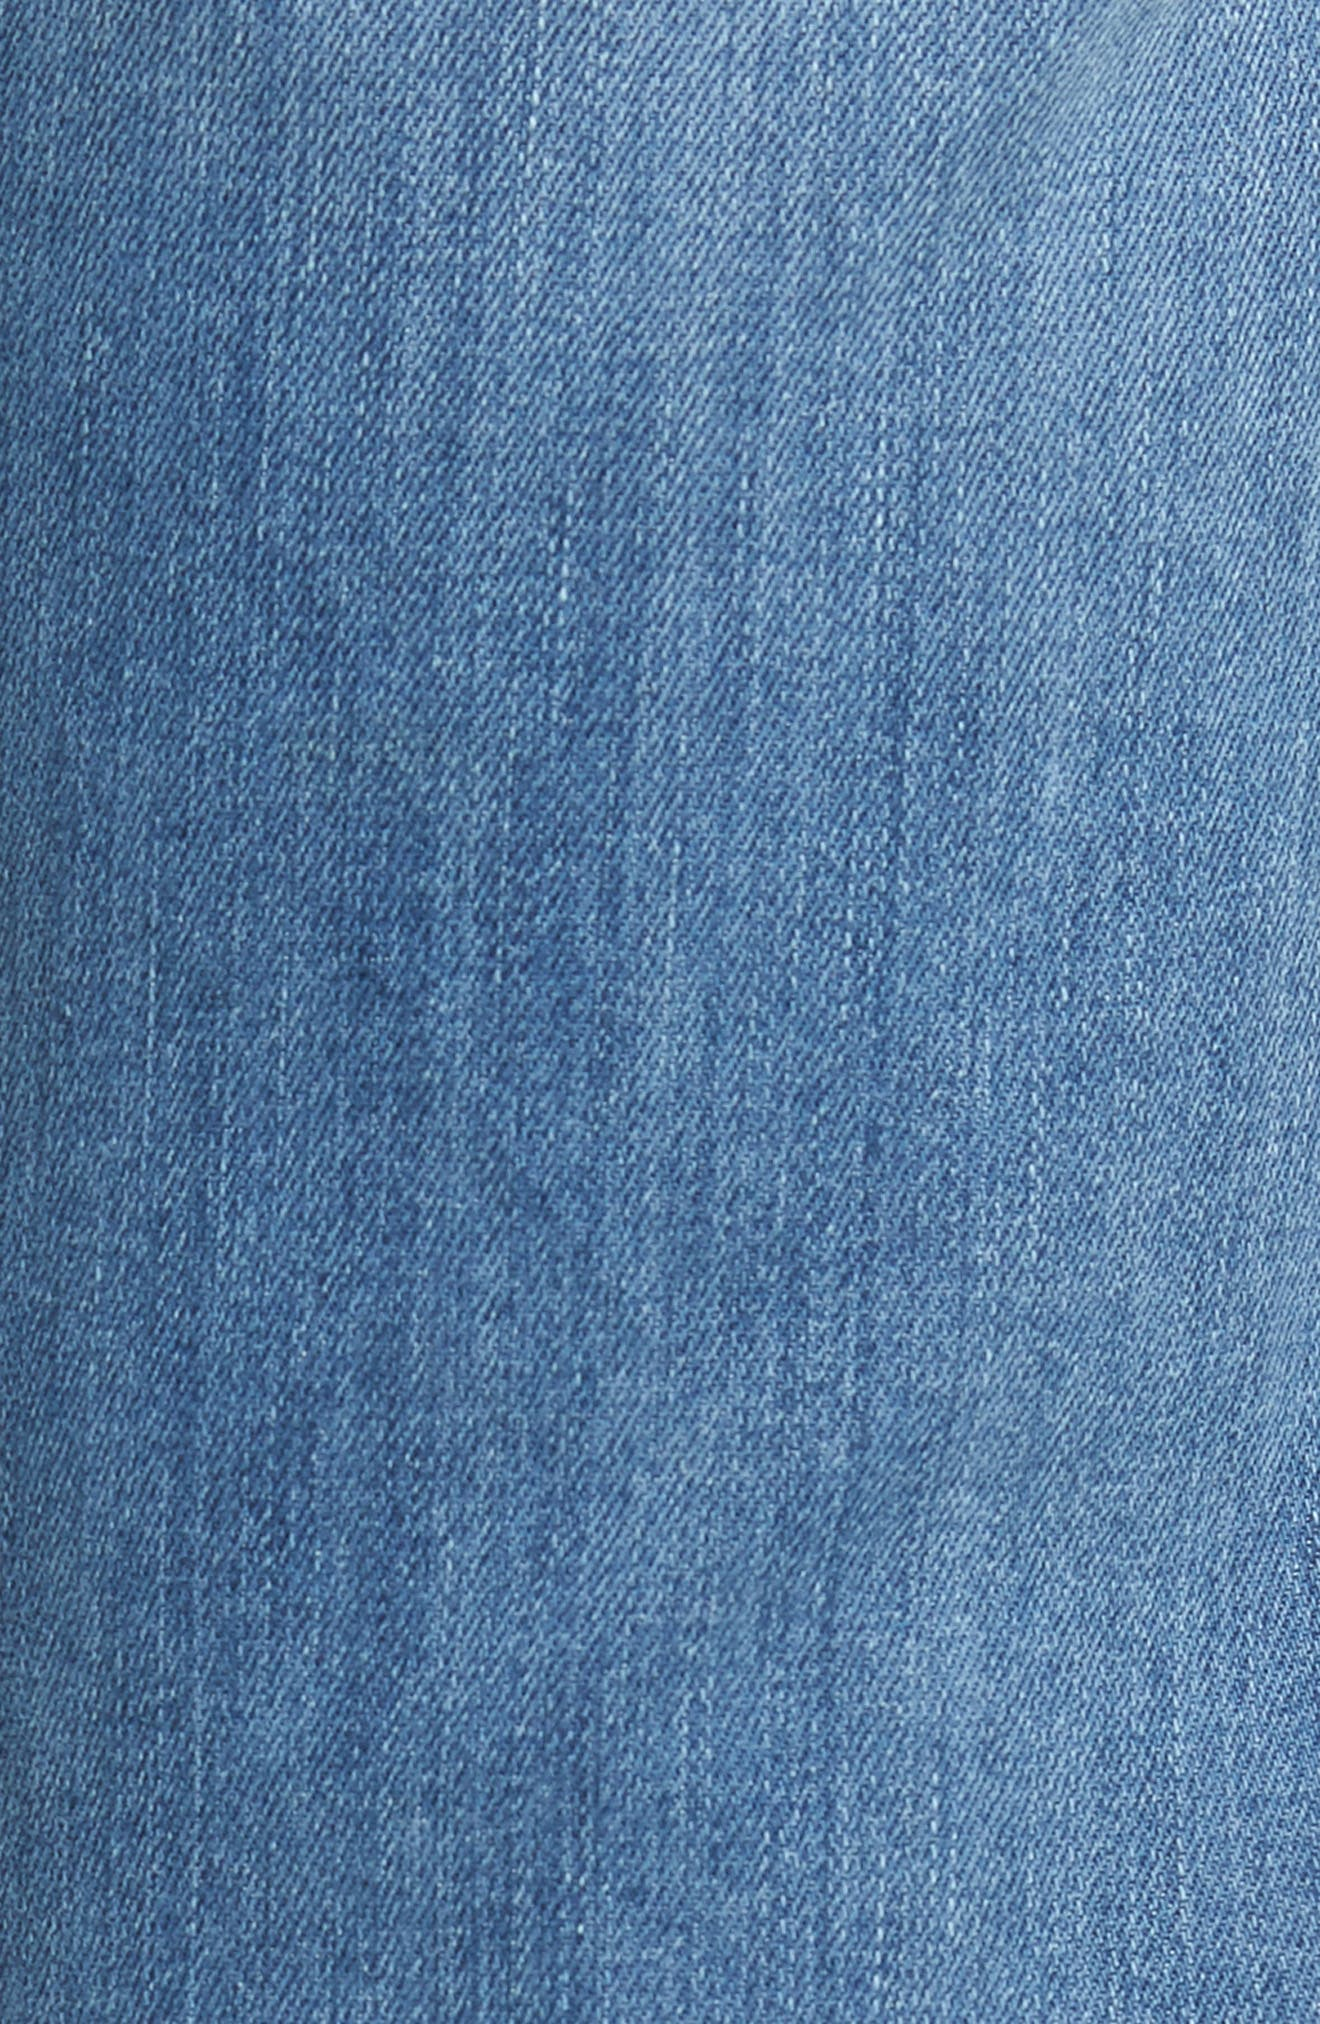 Jimmy Slim Straight Fit Jeans,                             Alternate thumbnail 5, color,                             Brixton Blue